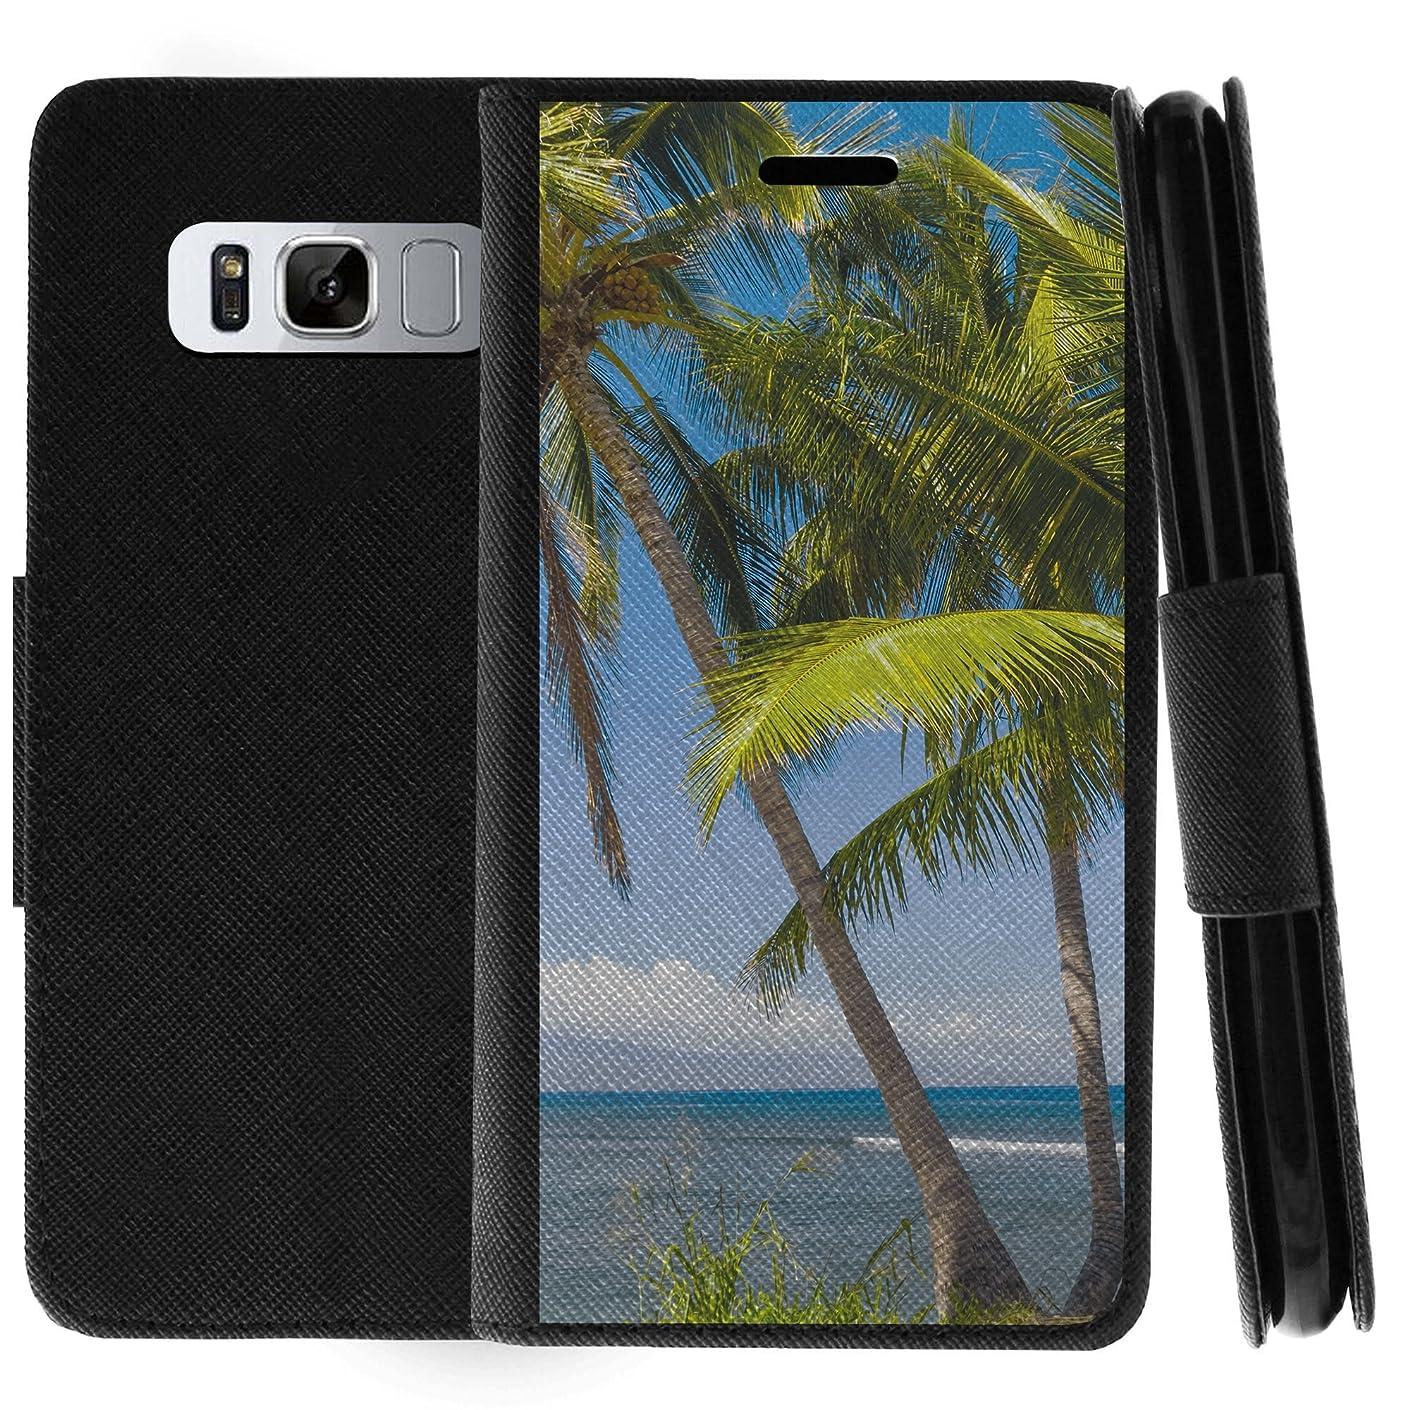 TurtleArmor | Samsung Galaxy Note 8 Case | N950 | Flip Kickstand Leather Flip Wallet Case Cover with Card Slots Ocean Beach Design - Coastal Shore